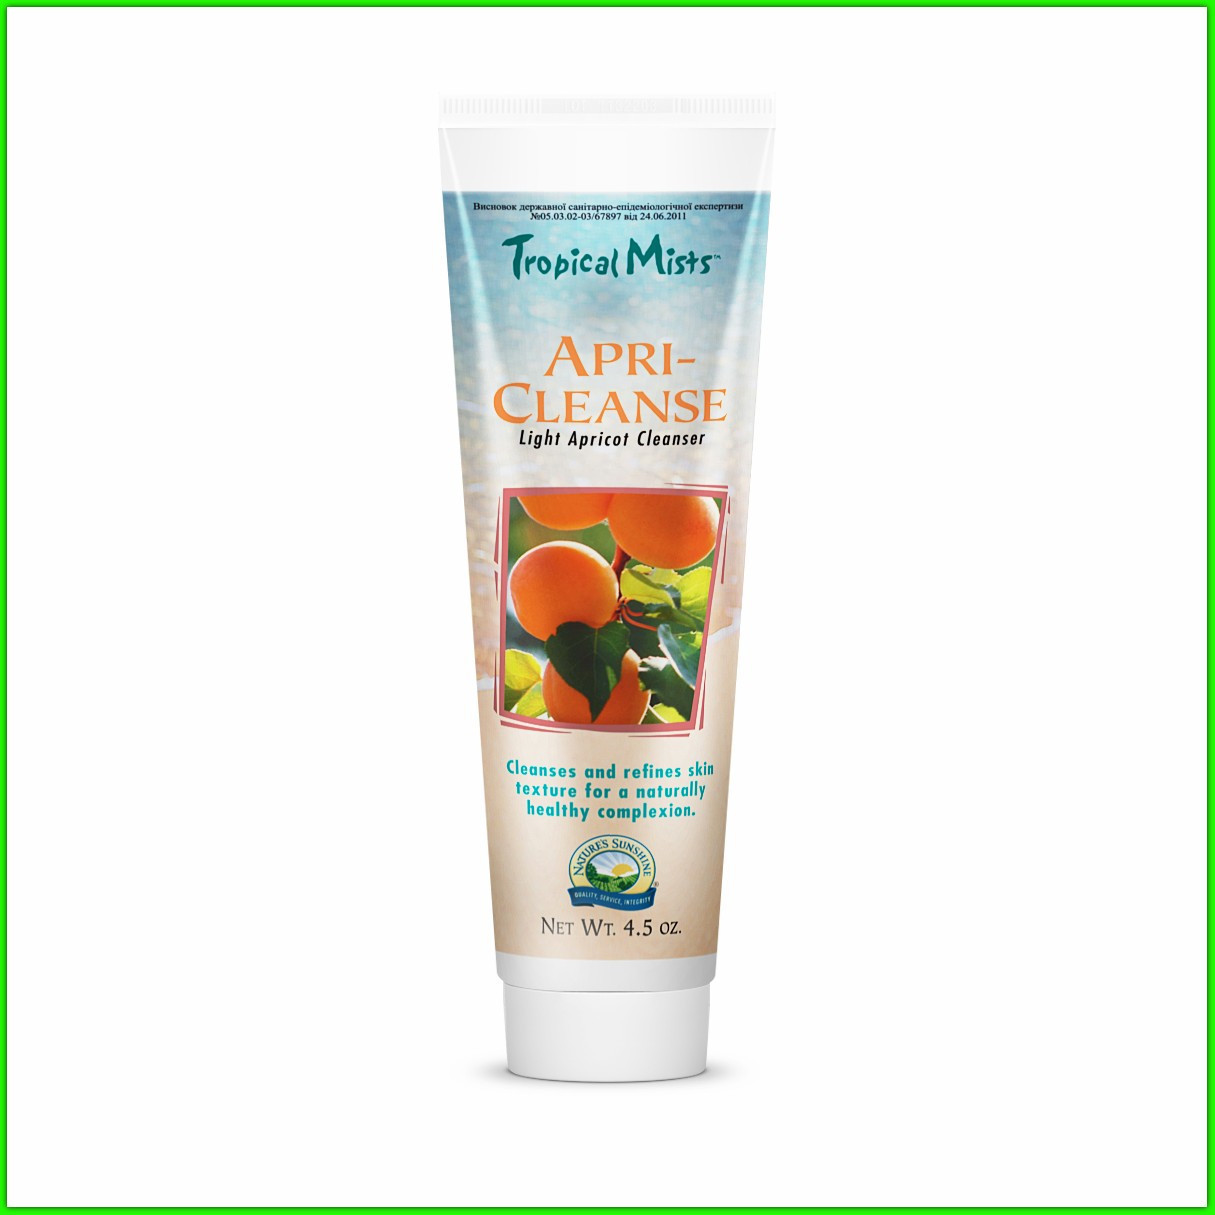 Скраб абрикосовый «Апри-клинс» для лица и тела НСП (Apri-Cleanse Light Apricot Cleanser NSP)